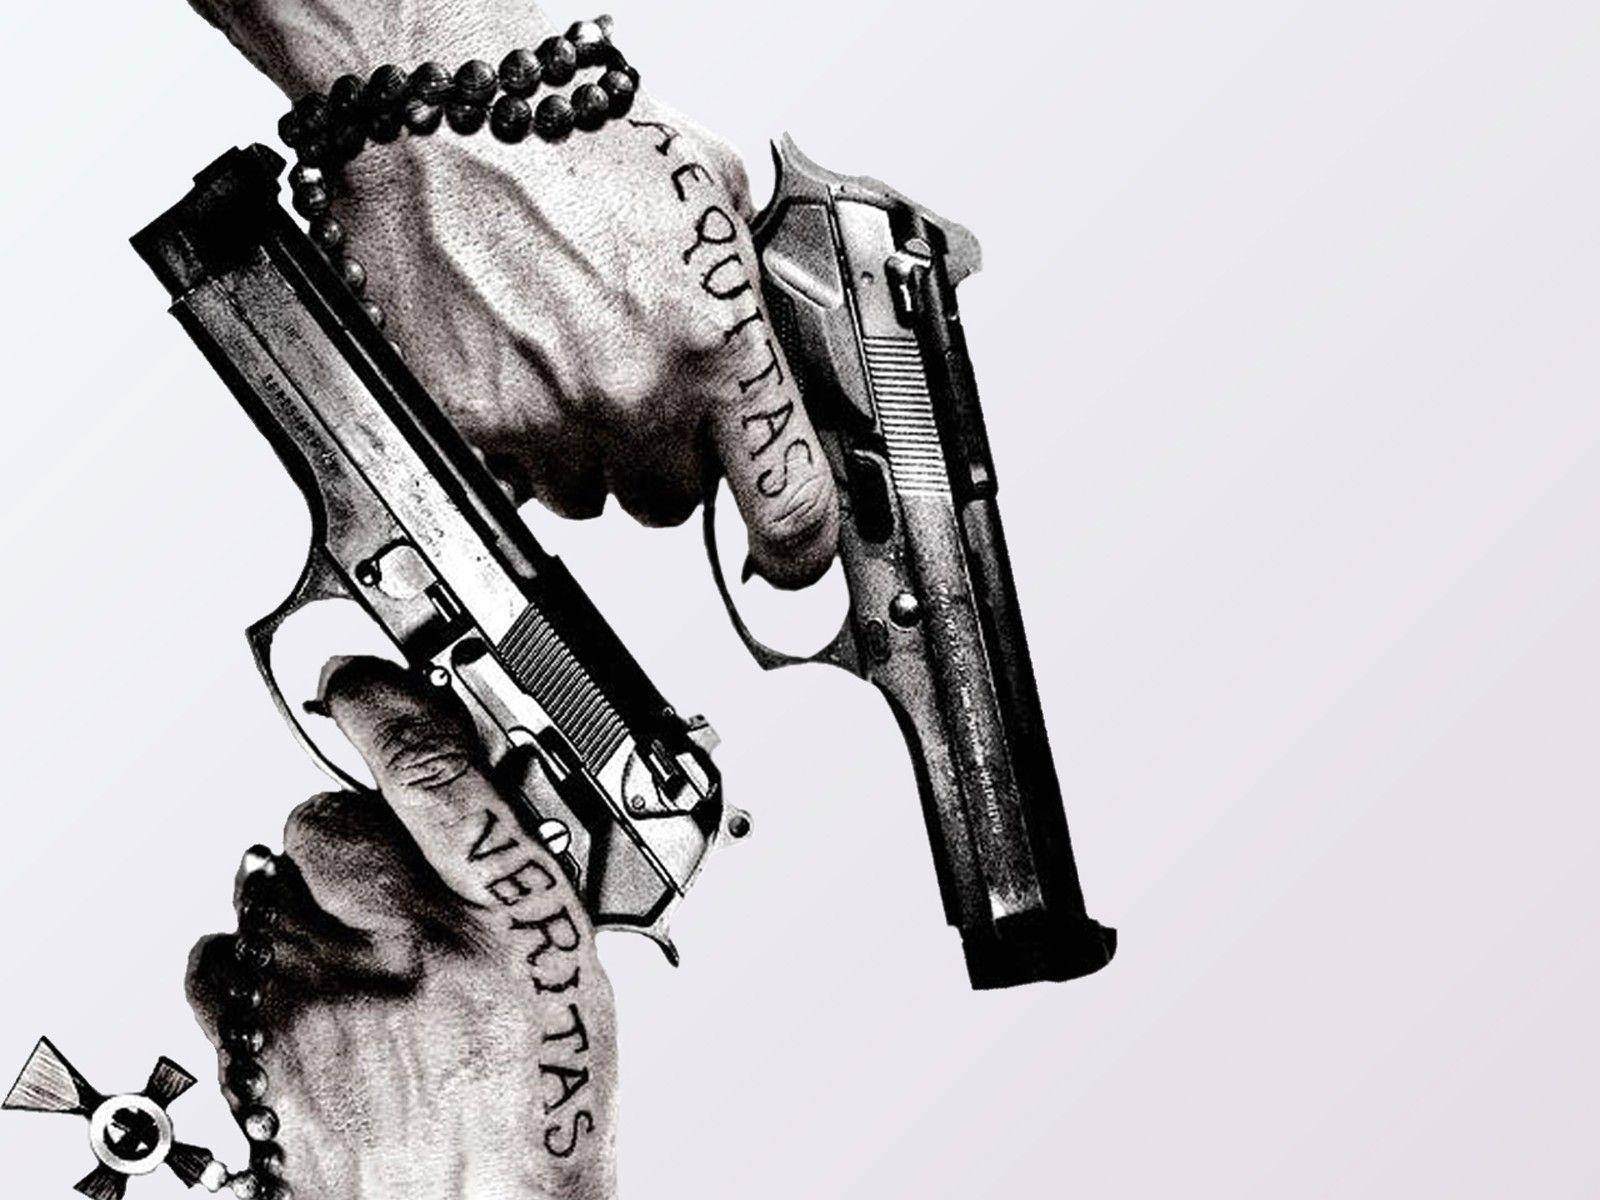 Картинки оружия на аватарку